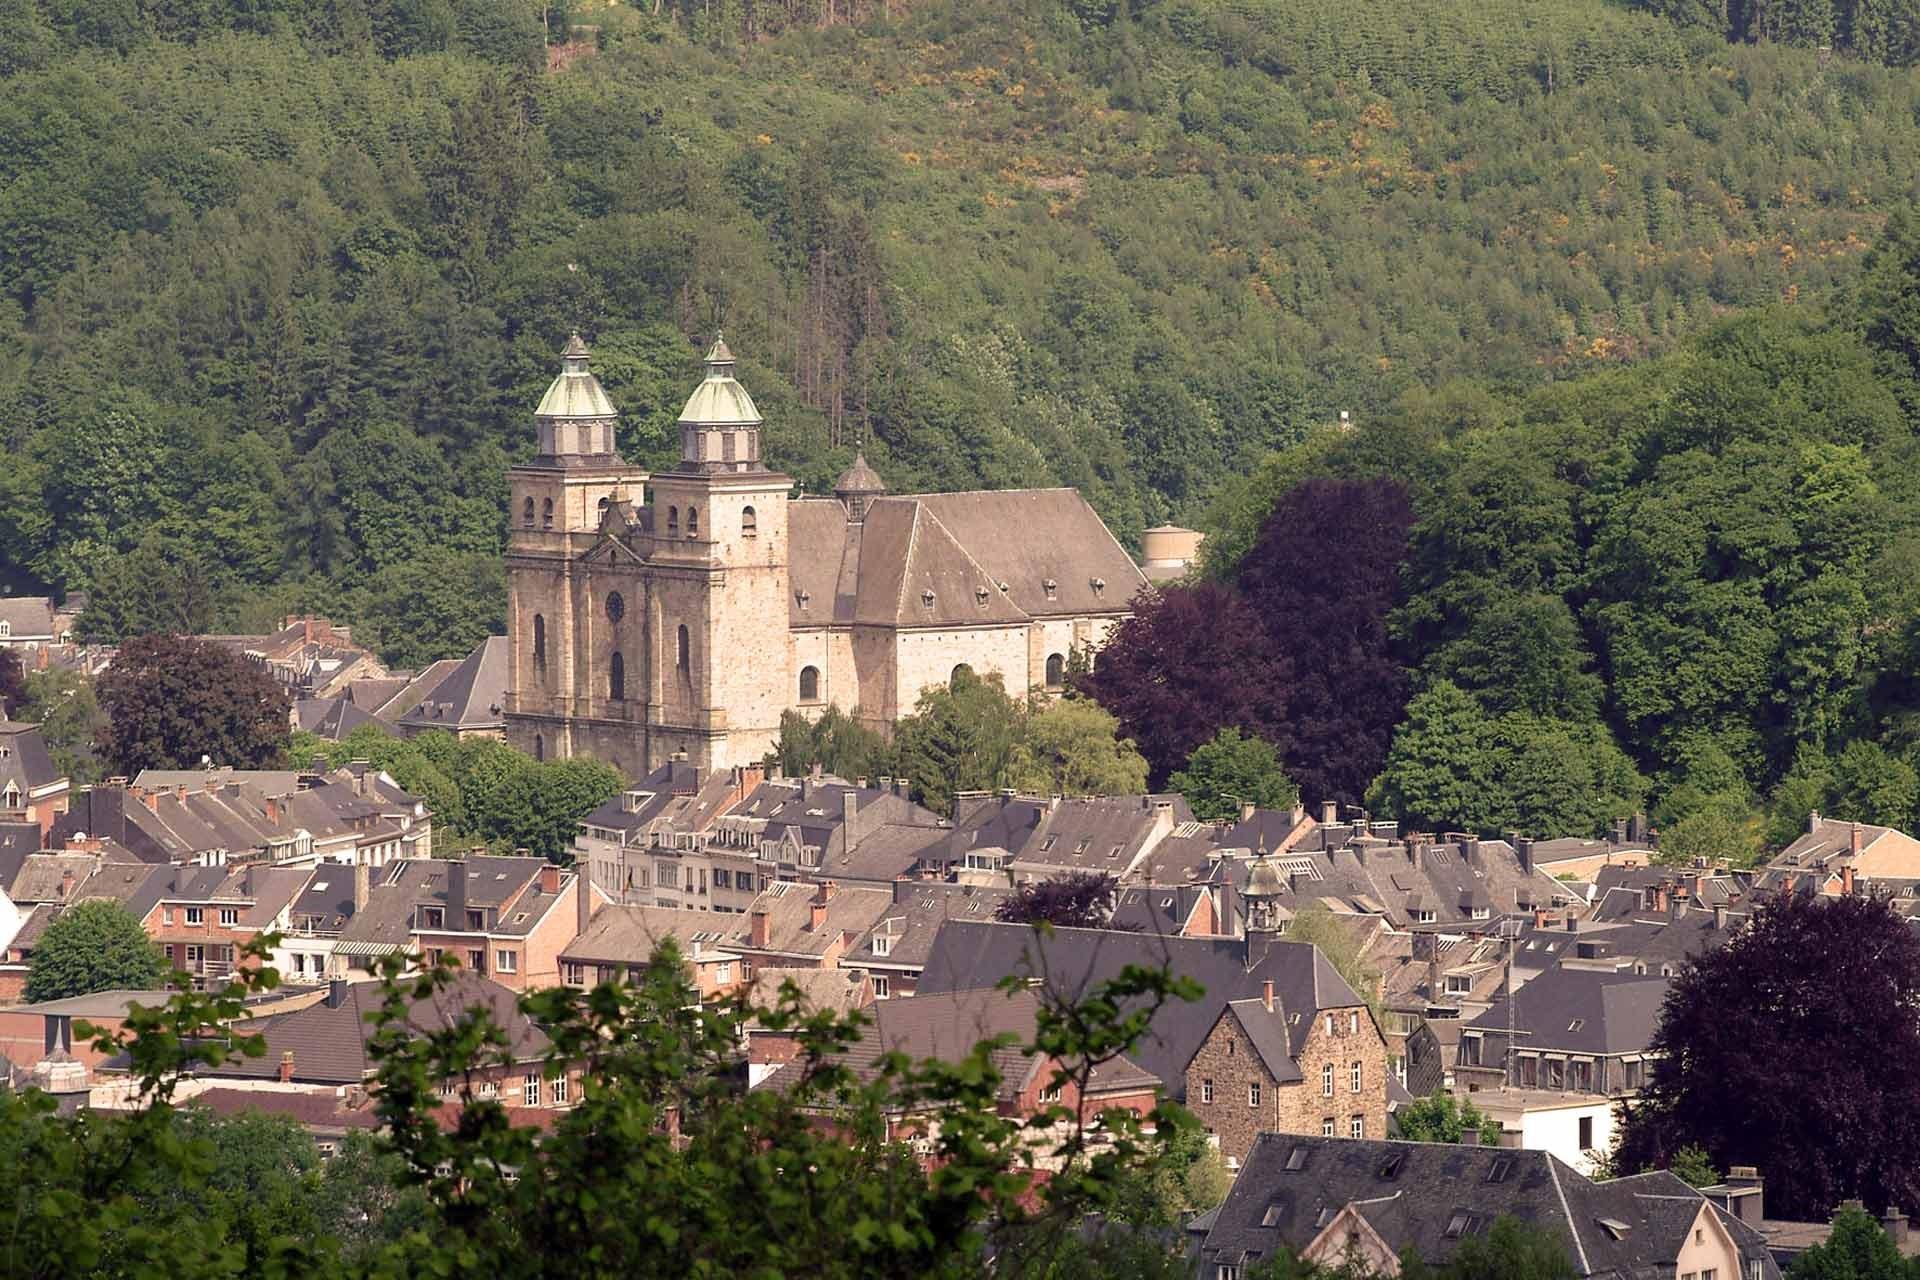 ardenne residences malmedy 4960 region landscapes city center basilica